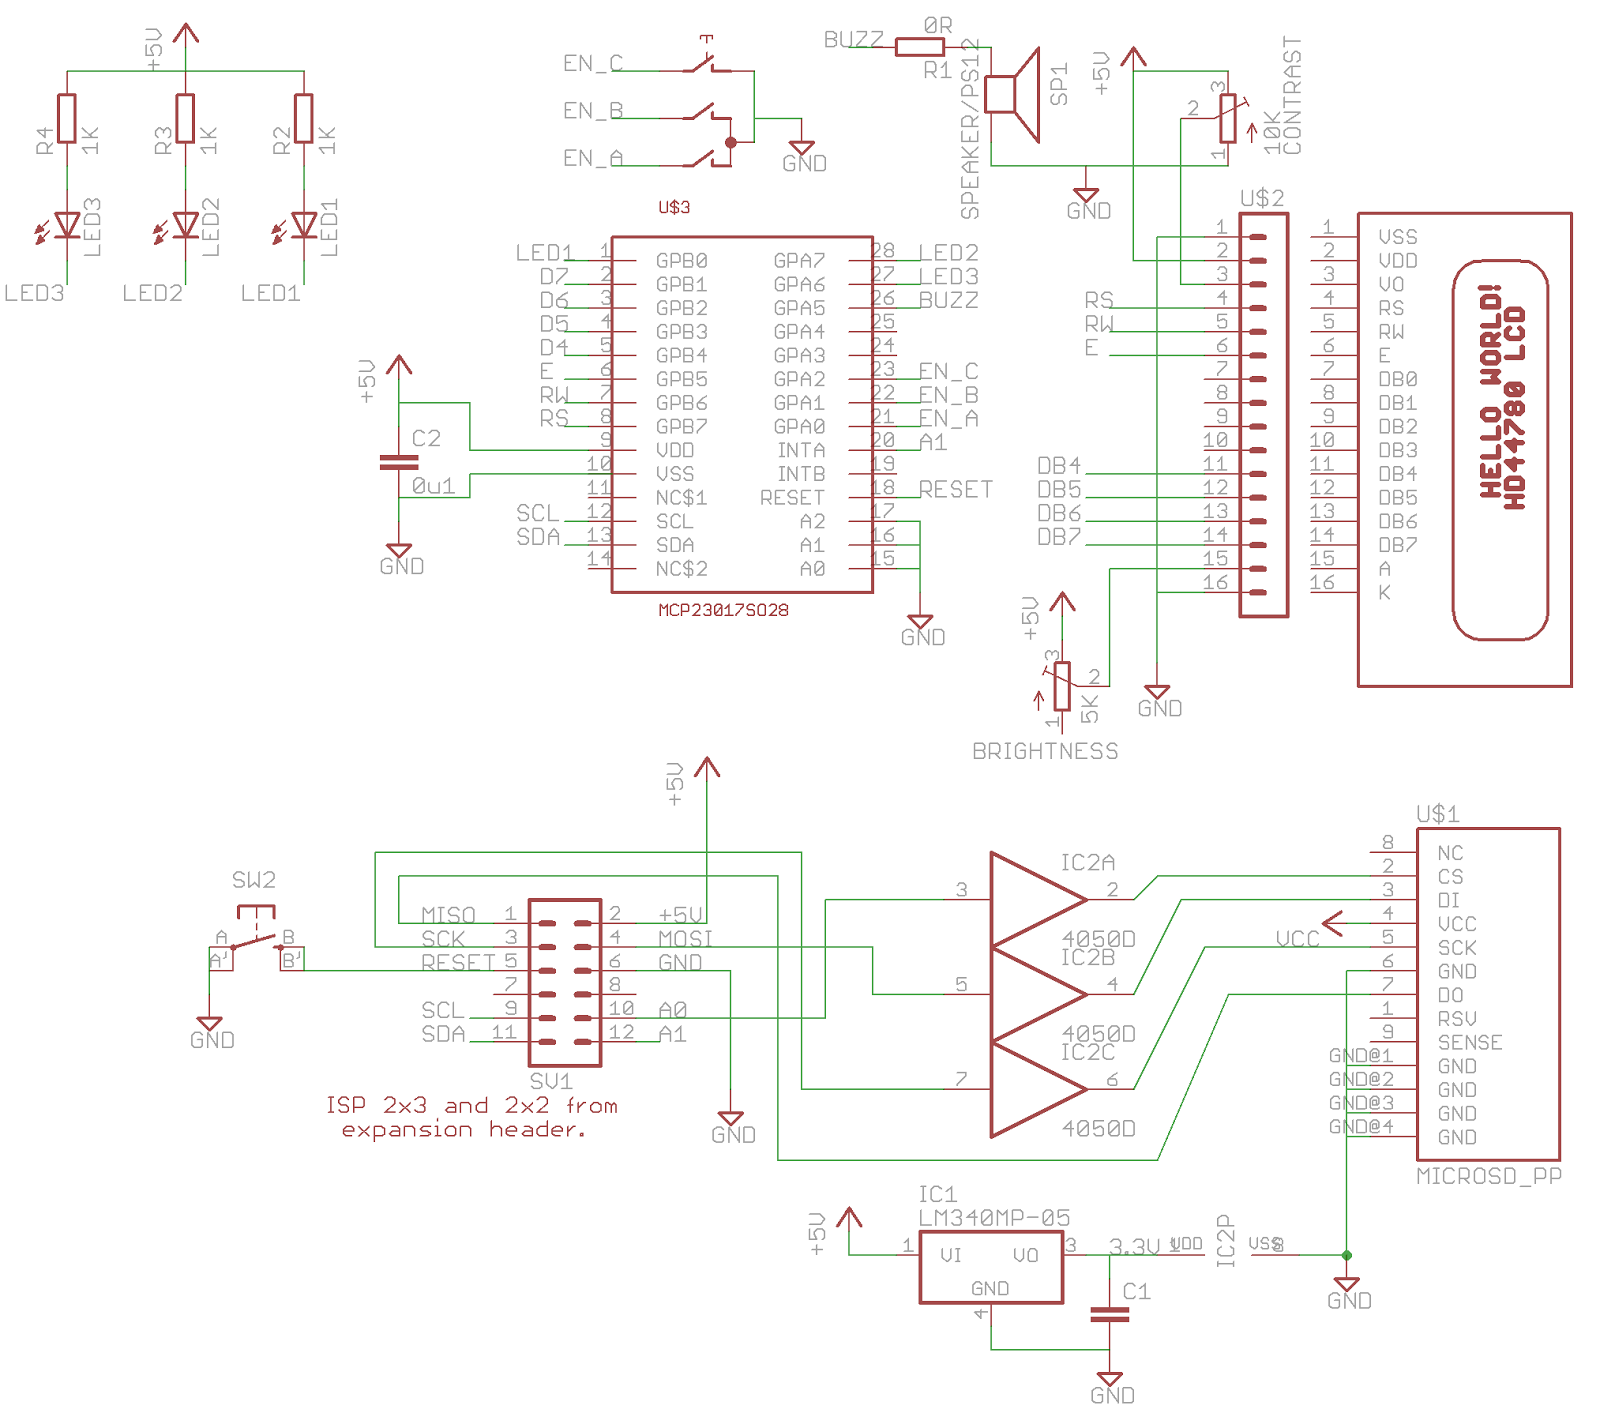 Think3dPrint3d: I2C port expander driving an LCD screen